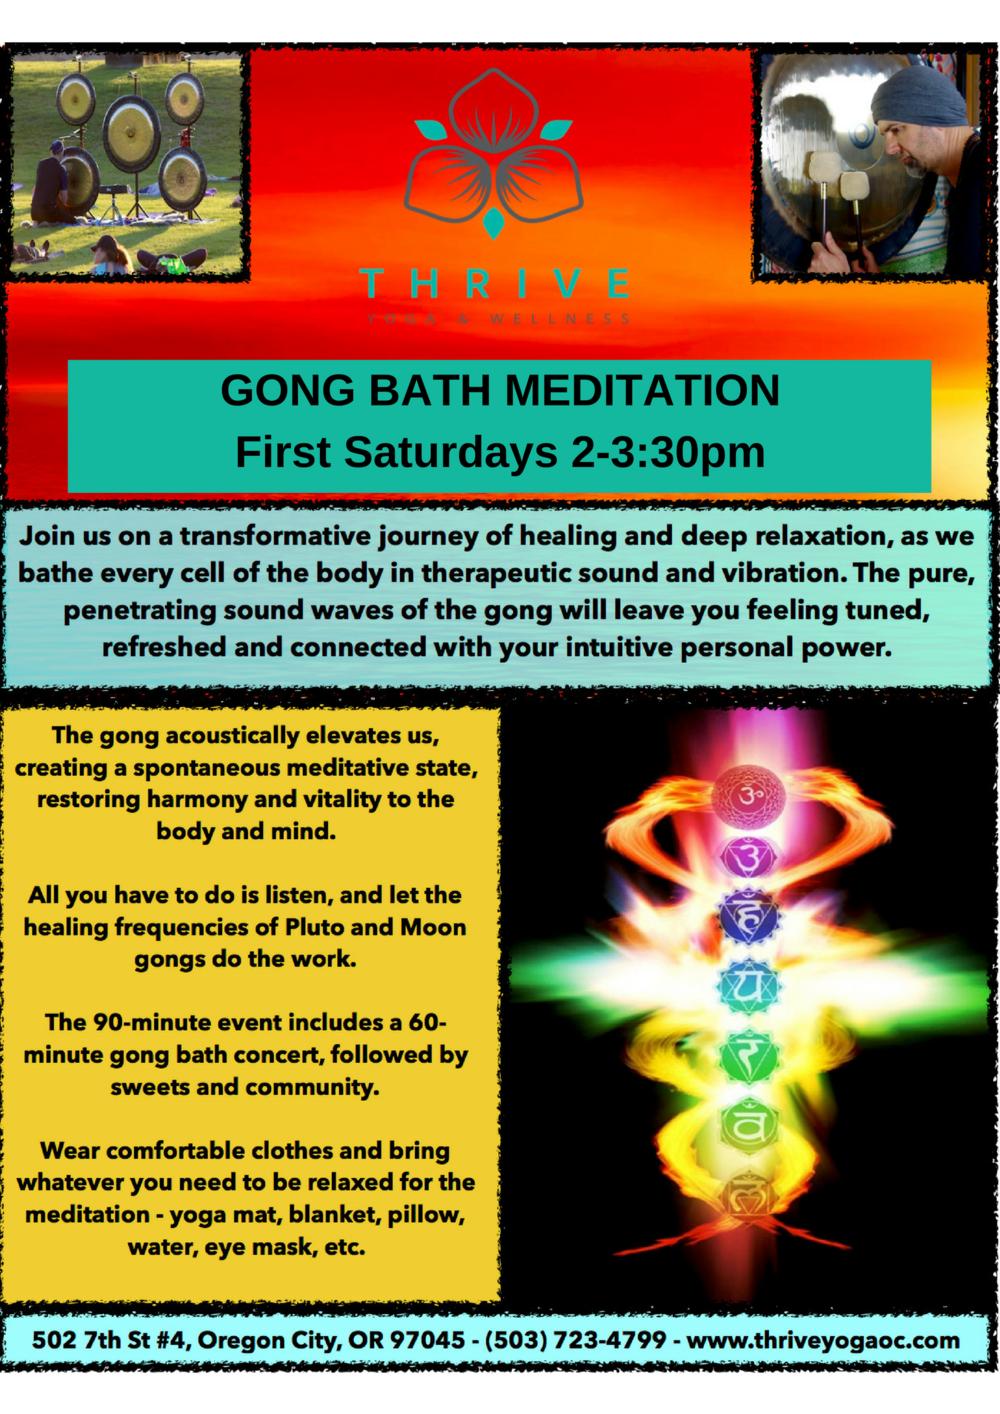 GONG BATH MEDITATIONFirst Saturdays 2-3_30pm.png